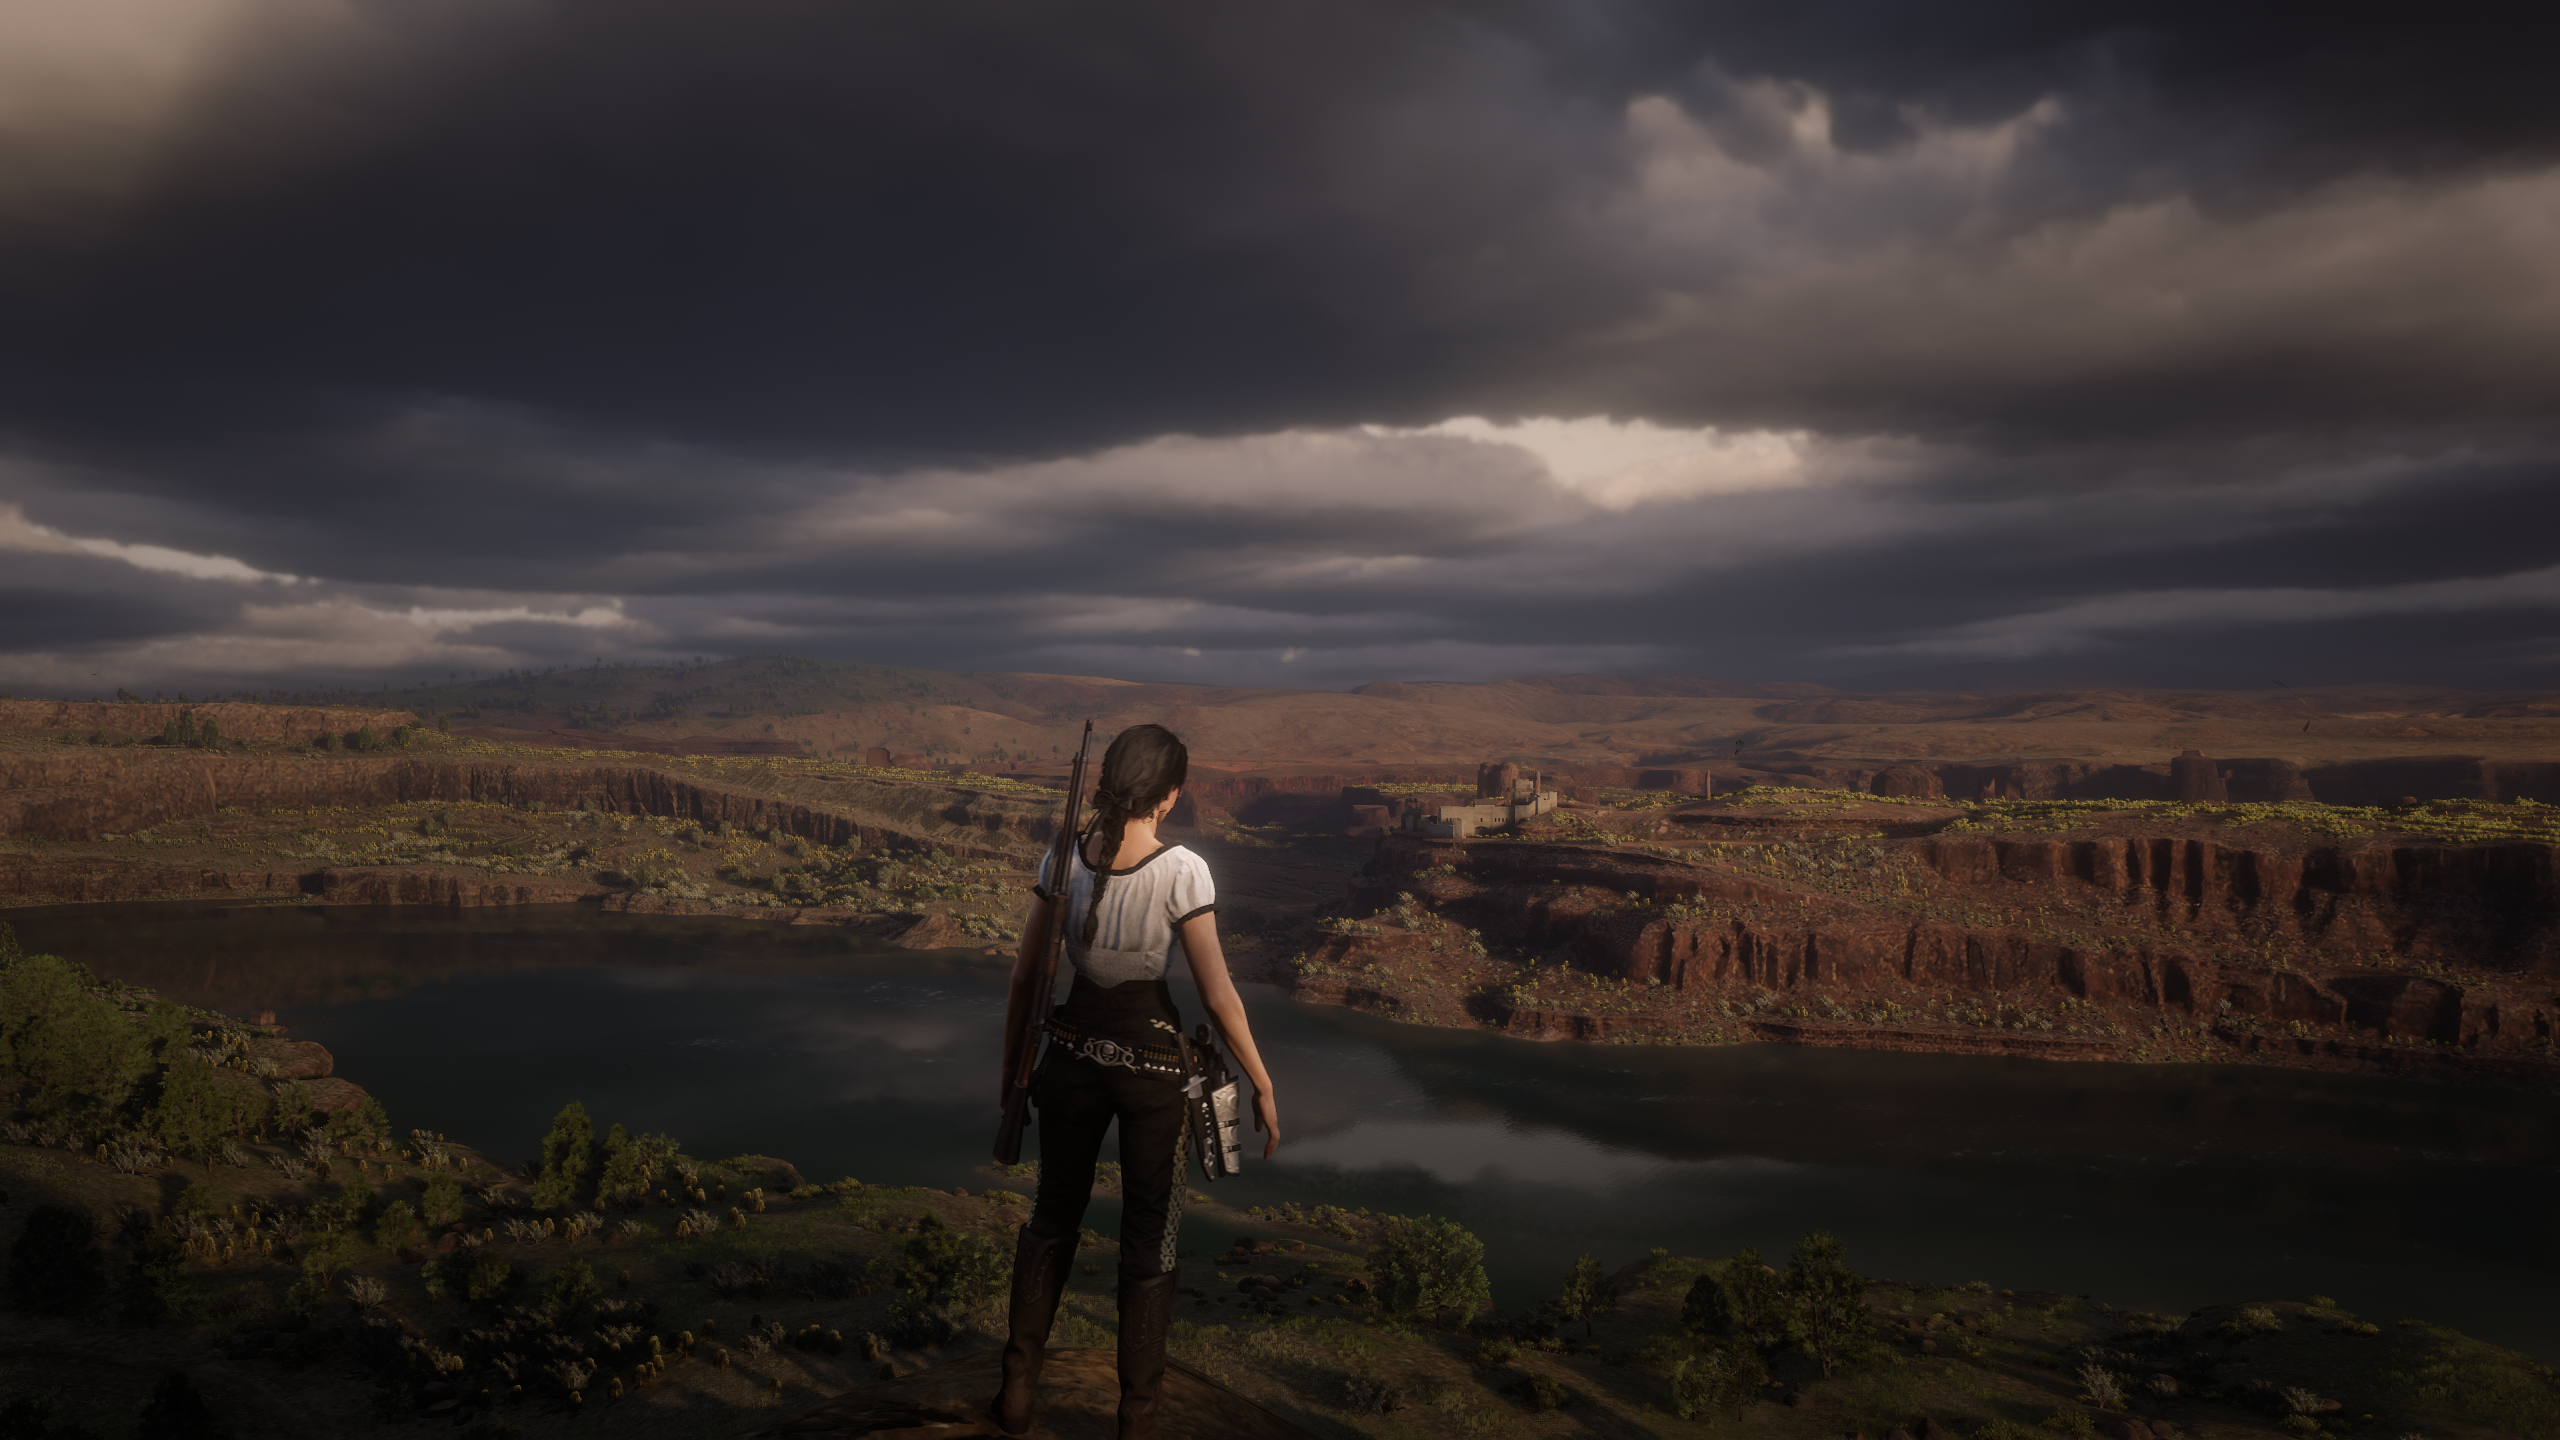 Red Dead Redemption 2 Screenshot 2020.12.07 - 14.38.33.75.png - Red Dead Redemption 2